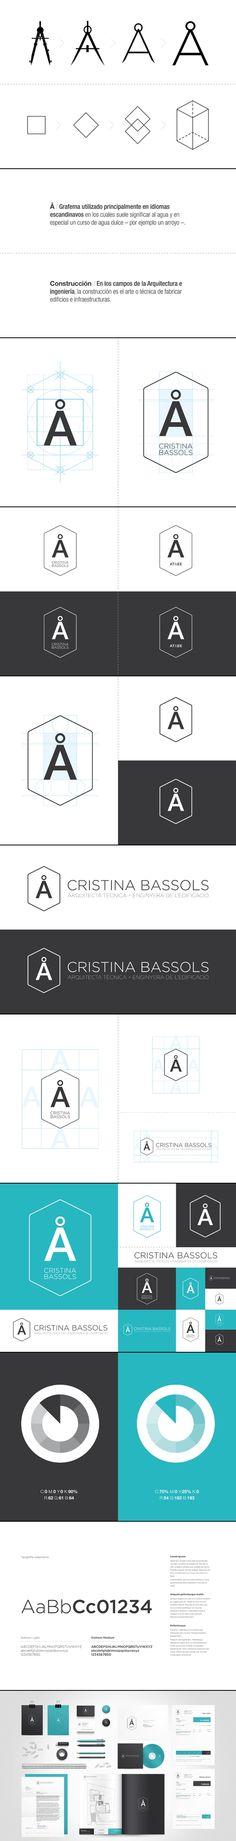 Architect Cristina Bassols Art Direction, Branding, Graphic Design via behance Corporate Identity, Visual Identity, Brand Identity, Brand Guidelines, Brand Design, Art Direction, Arch, Behance, Graphic Design